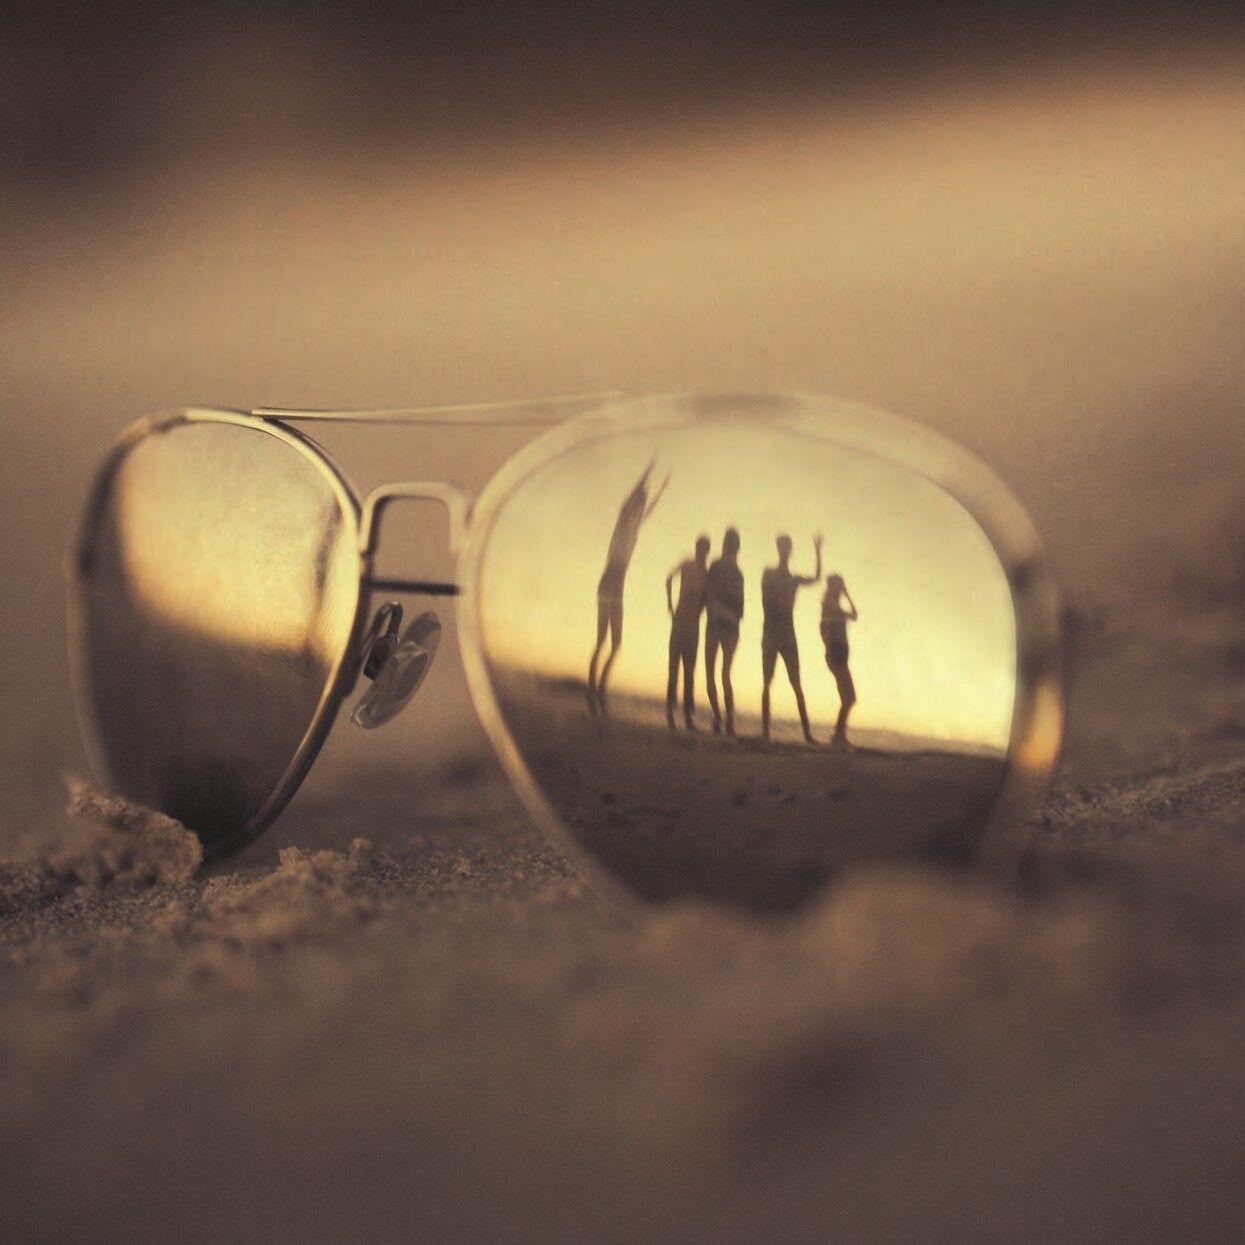 NIKAweb 1.60 Sonnenbrillengläser 85% Tönung Kunststoff Brillengläser HMC HMC+